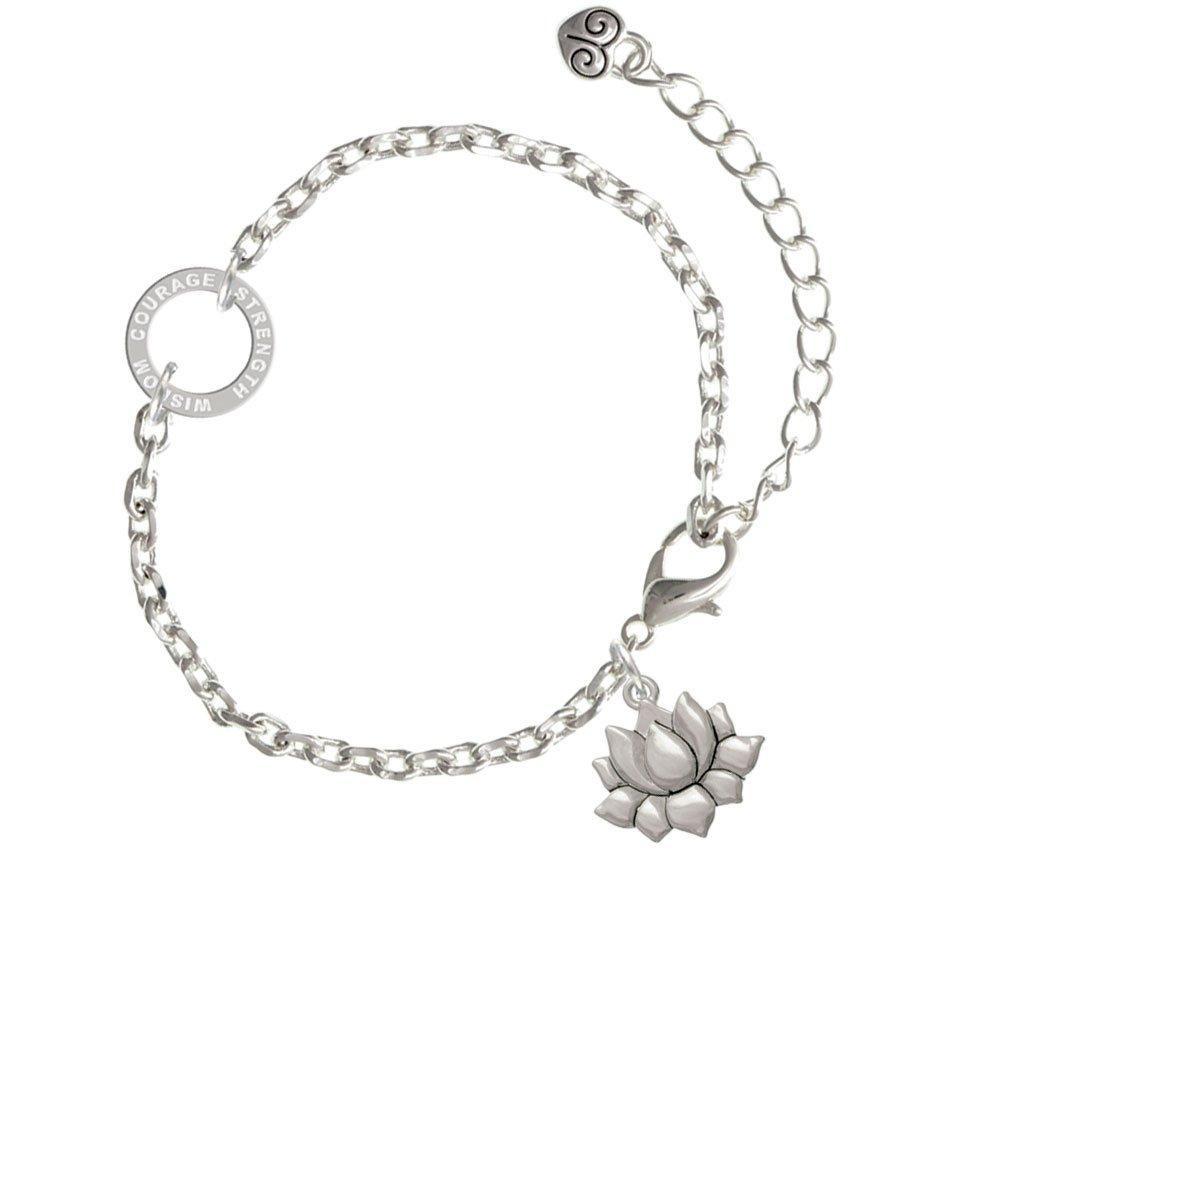 Small Lotus Flower Courage Strength Wisdom Ring Zoe Bracelet